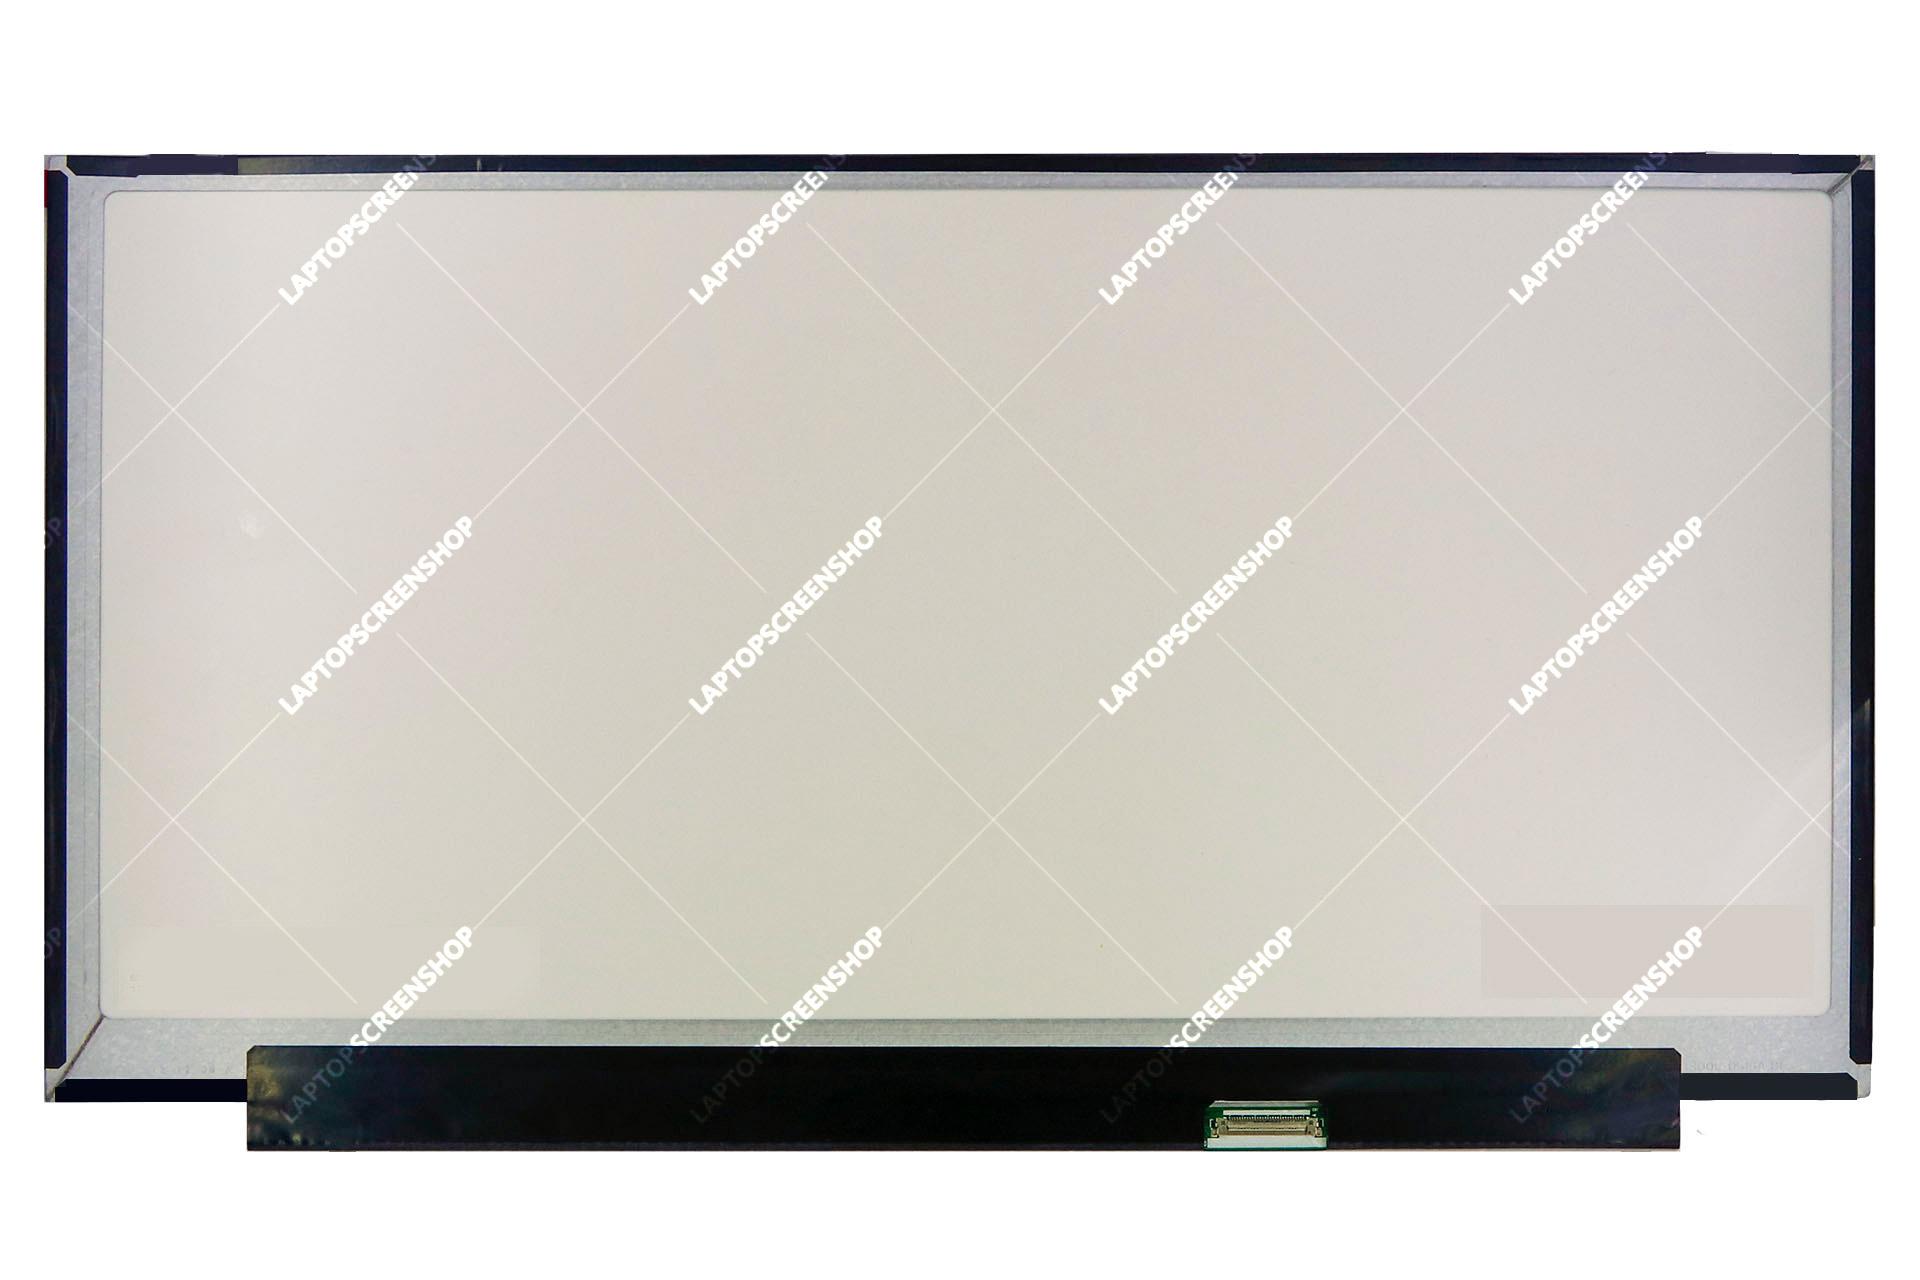 NV156FHM-N45-LCD|FHD|فروشگاه لپ تاپ اسکرين | تعمير لپ تاپ